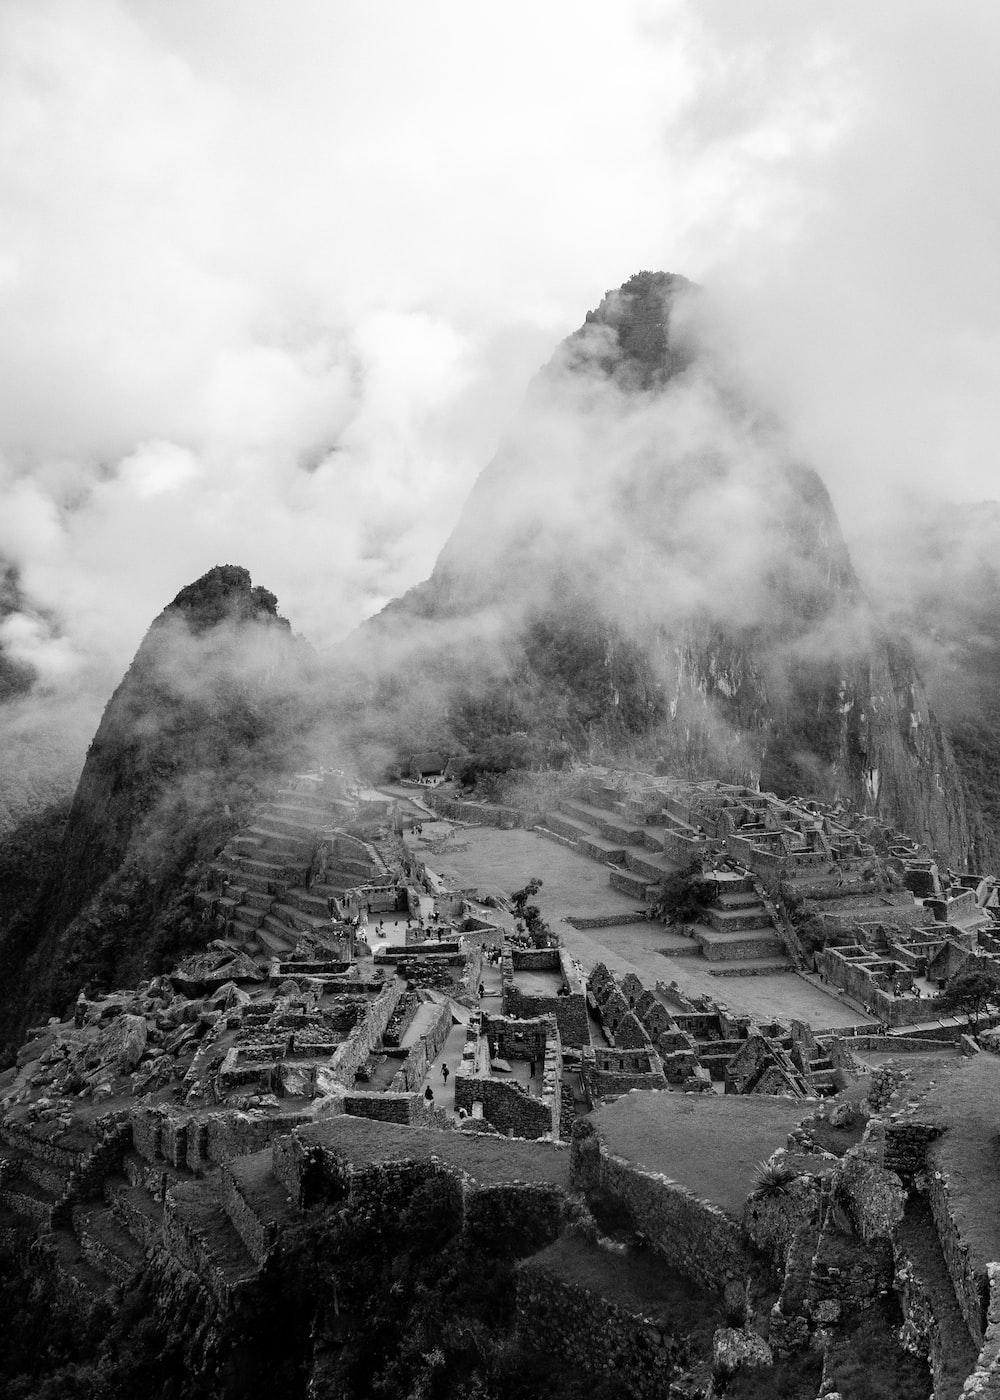 grayscale photo of mountain with smoke